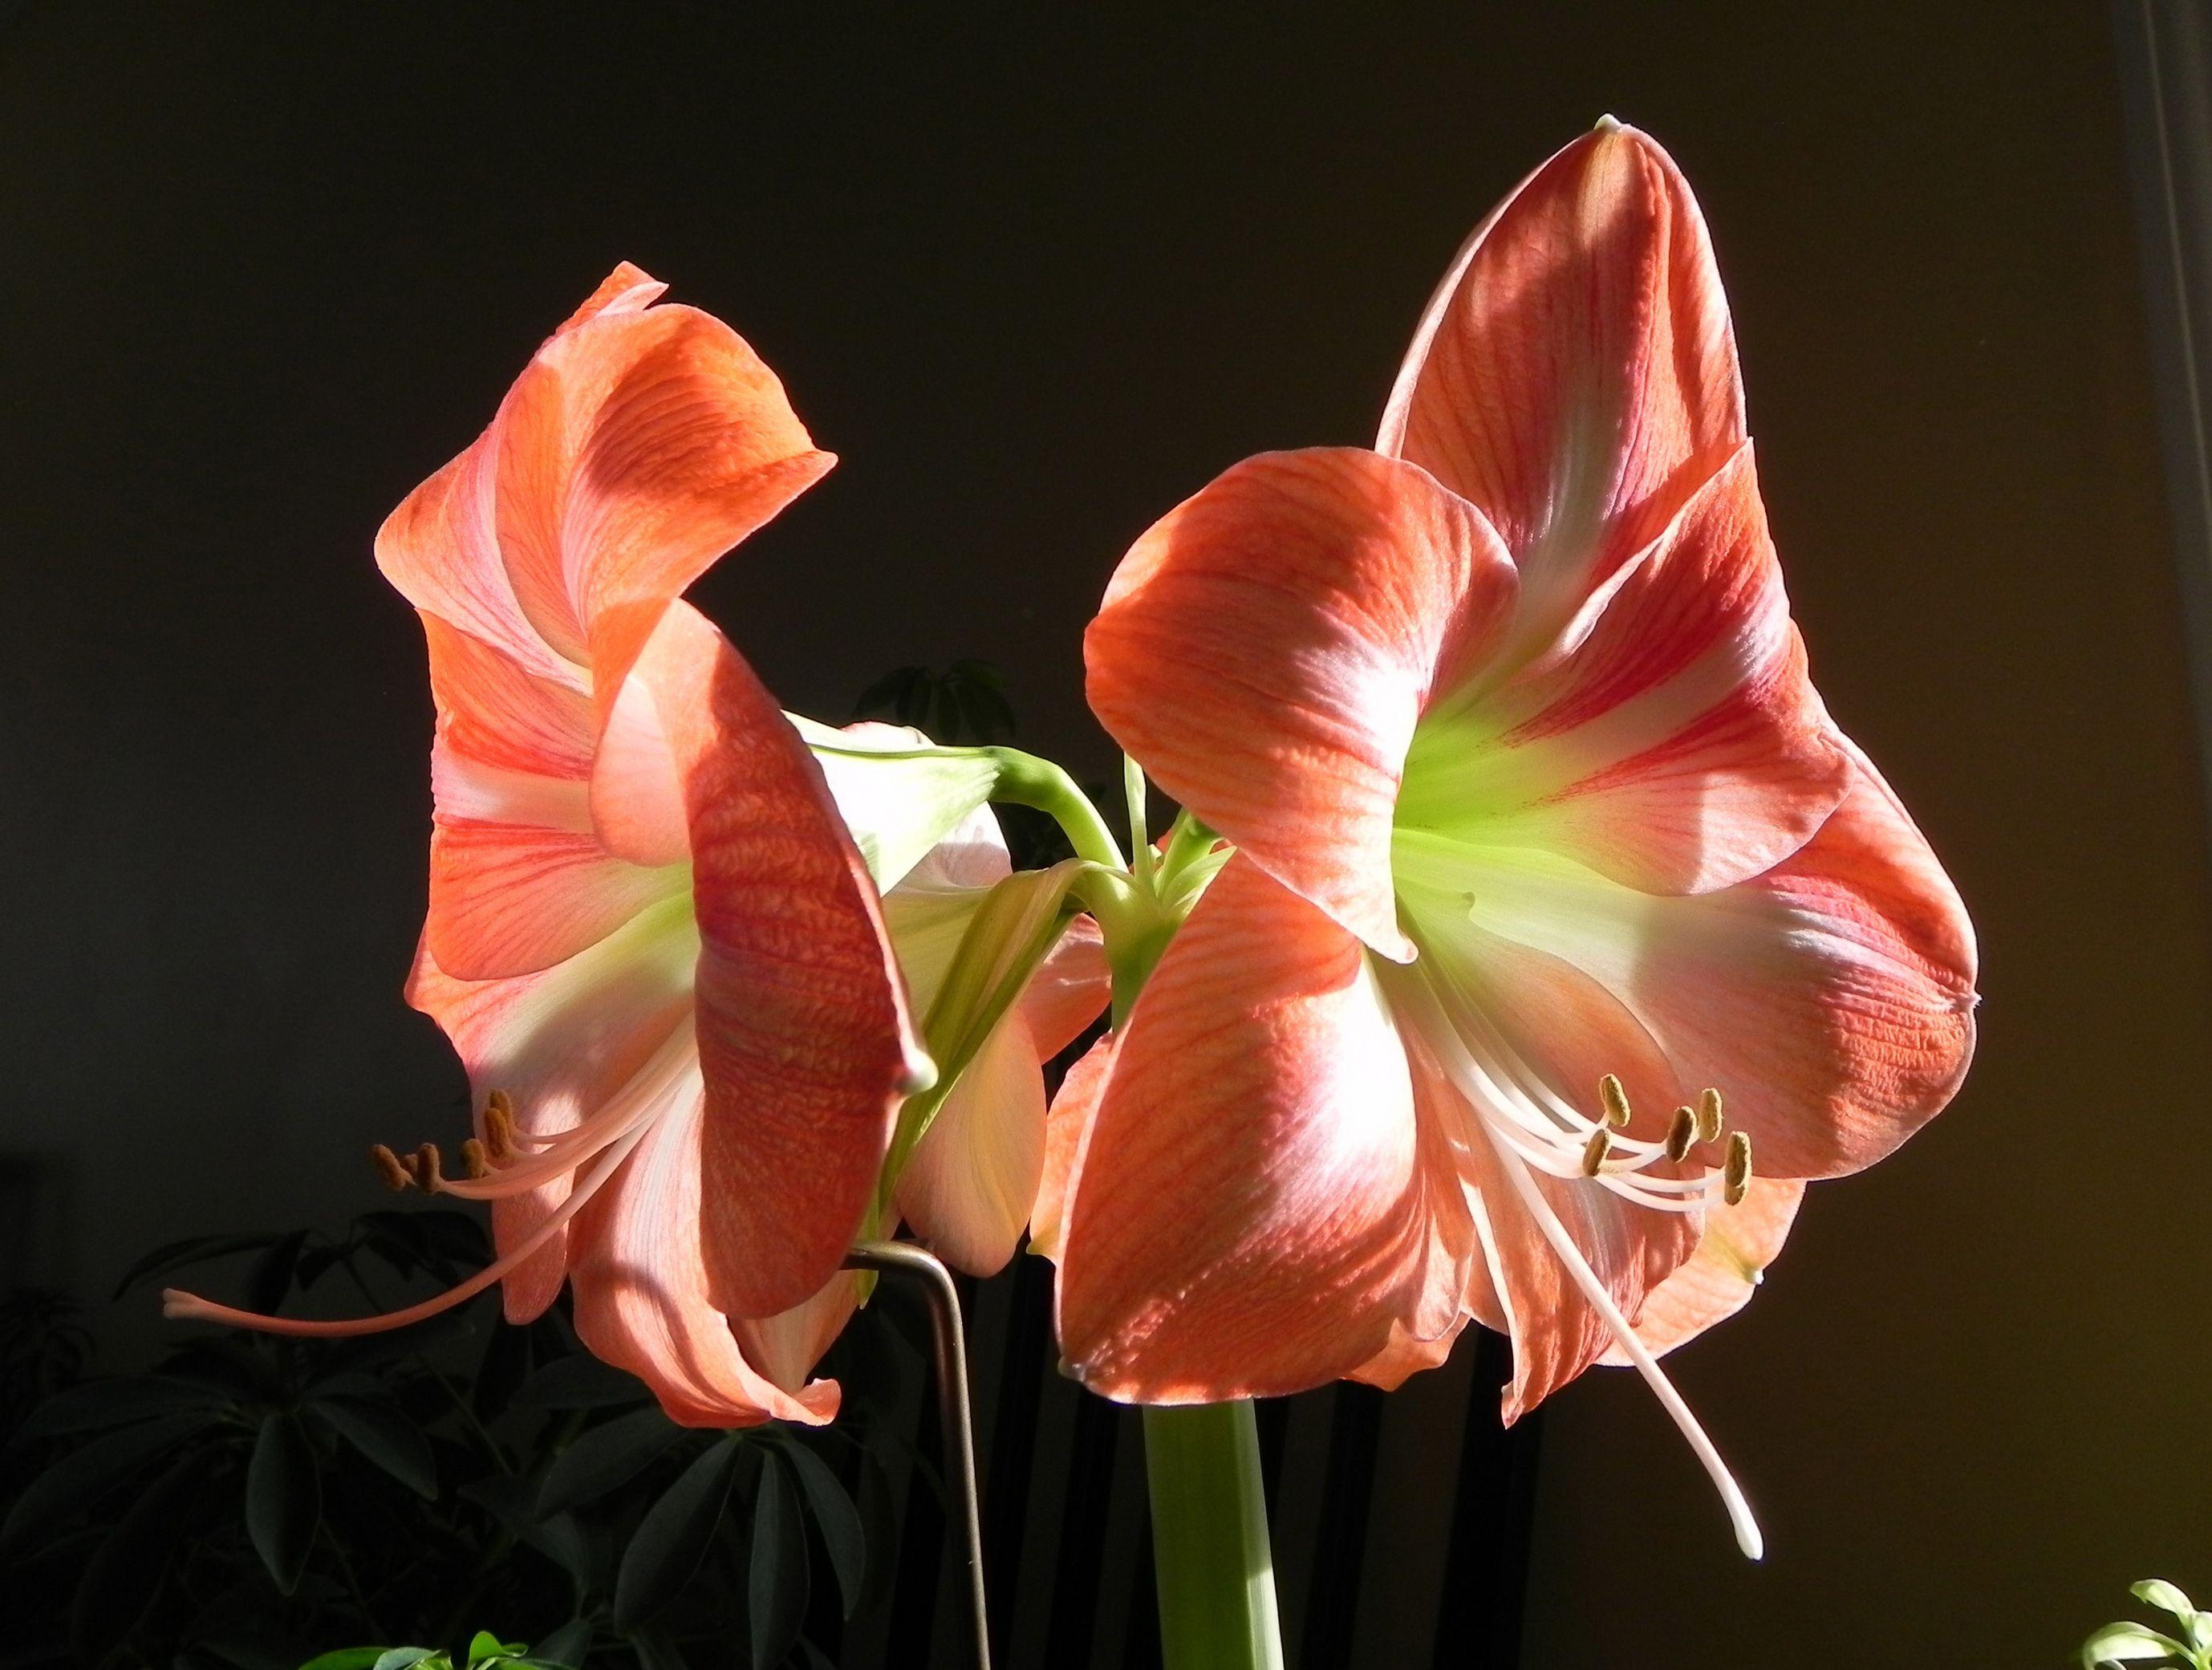 одной фото цветка амариллис клюет дна весу